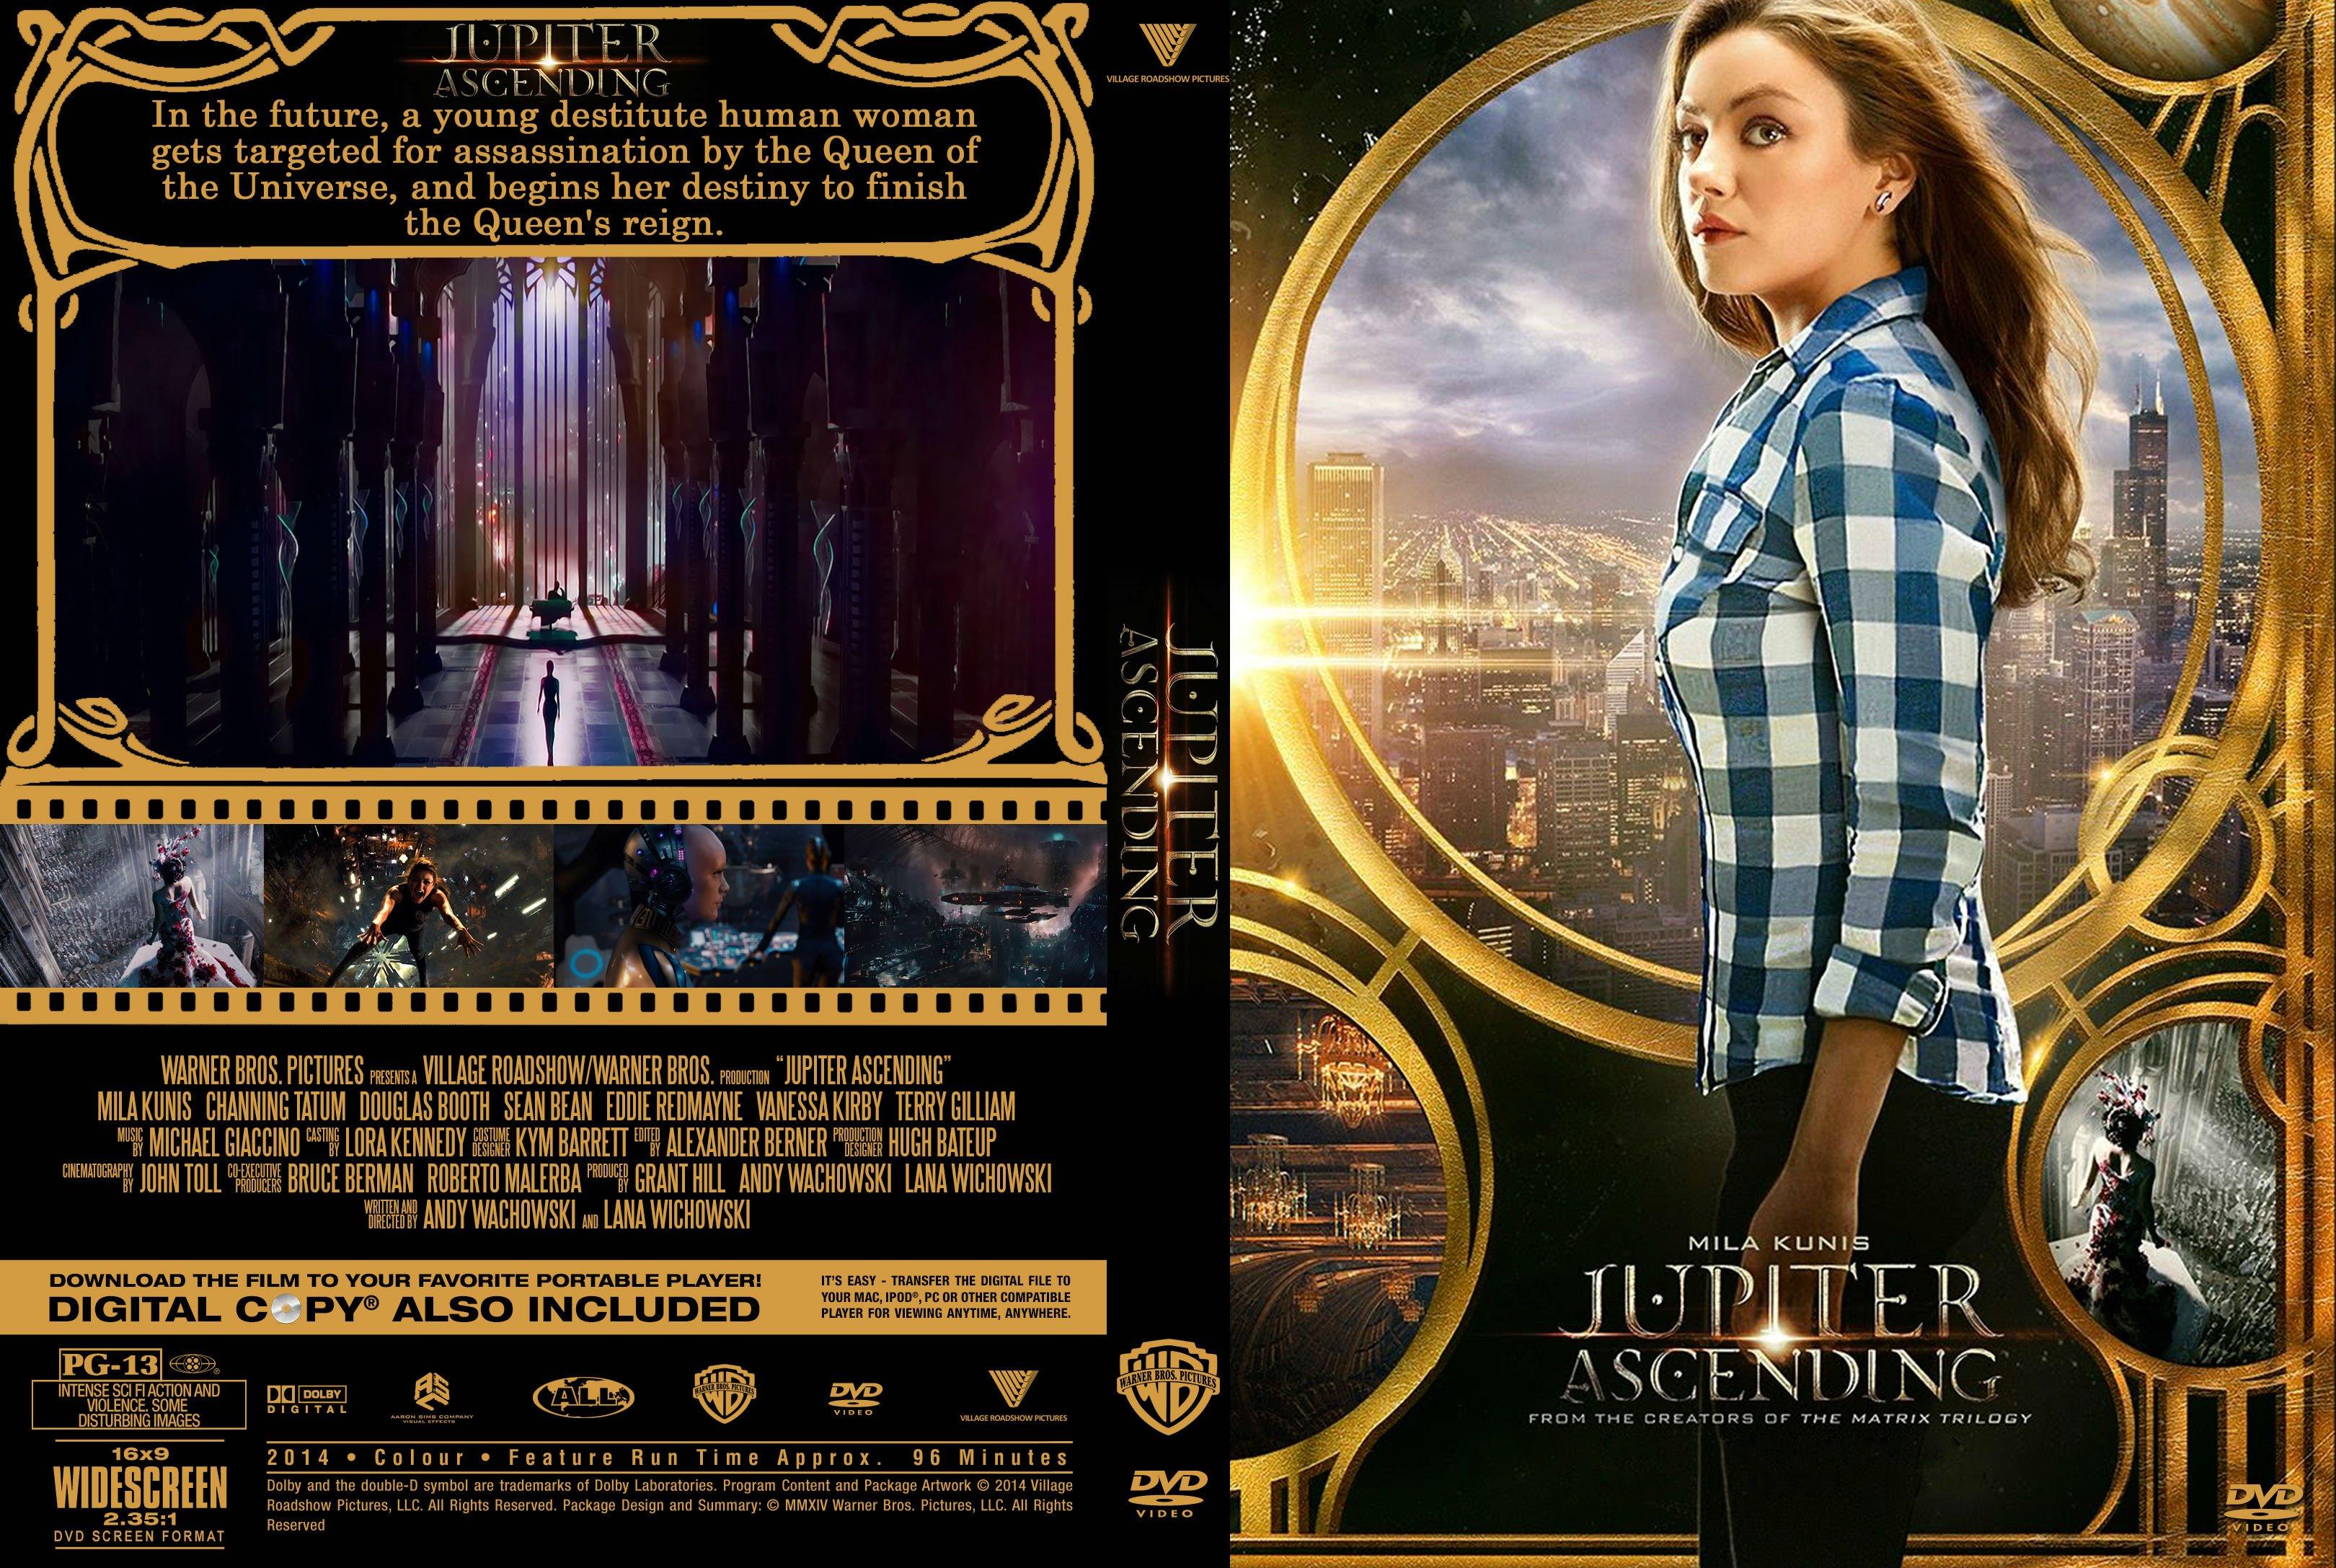 Jupiter Ascending Action Adventure Sci Fi Movie Film 29